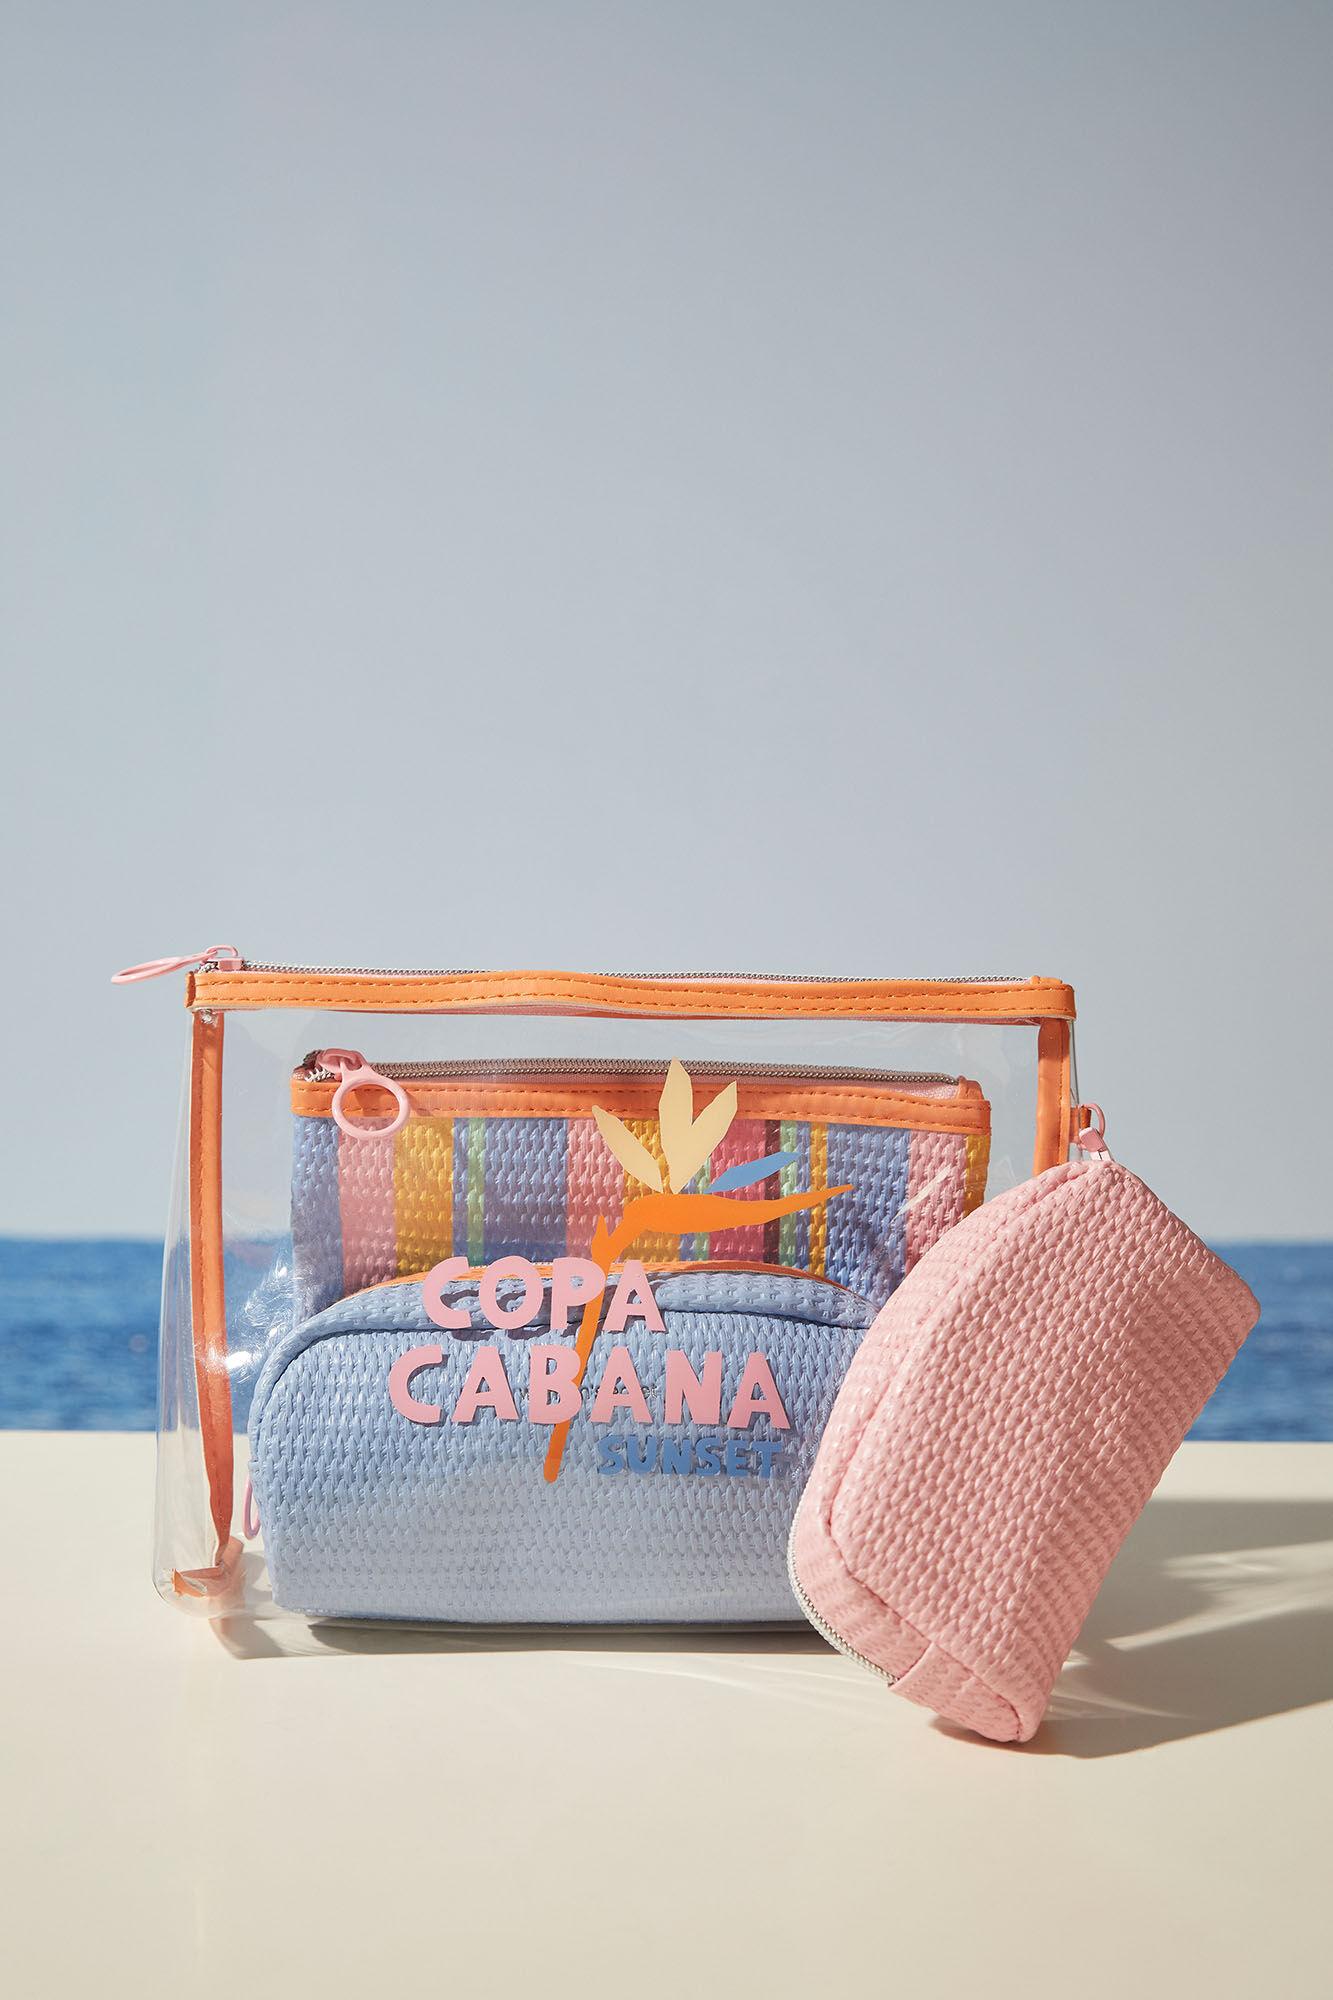 Pack 3 neceseres Copa Cabana